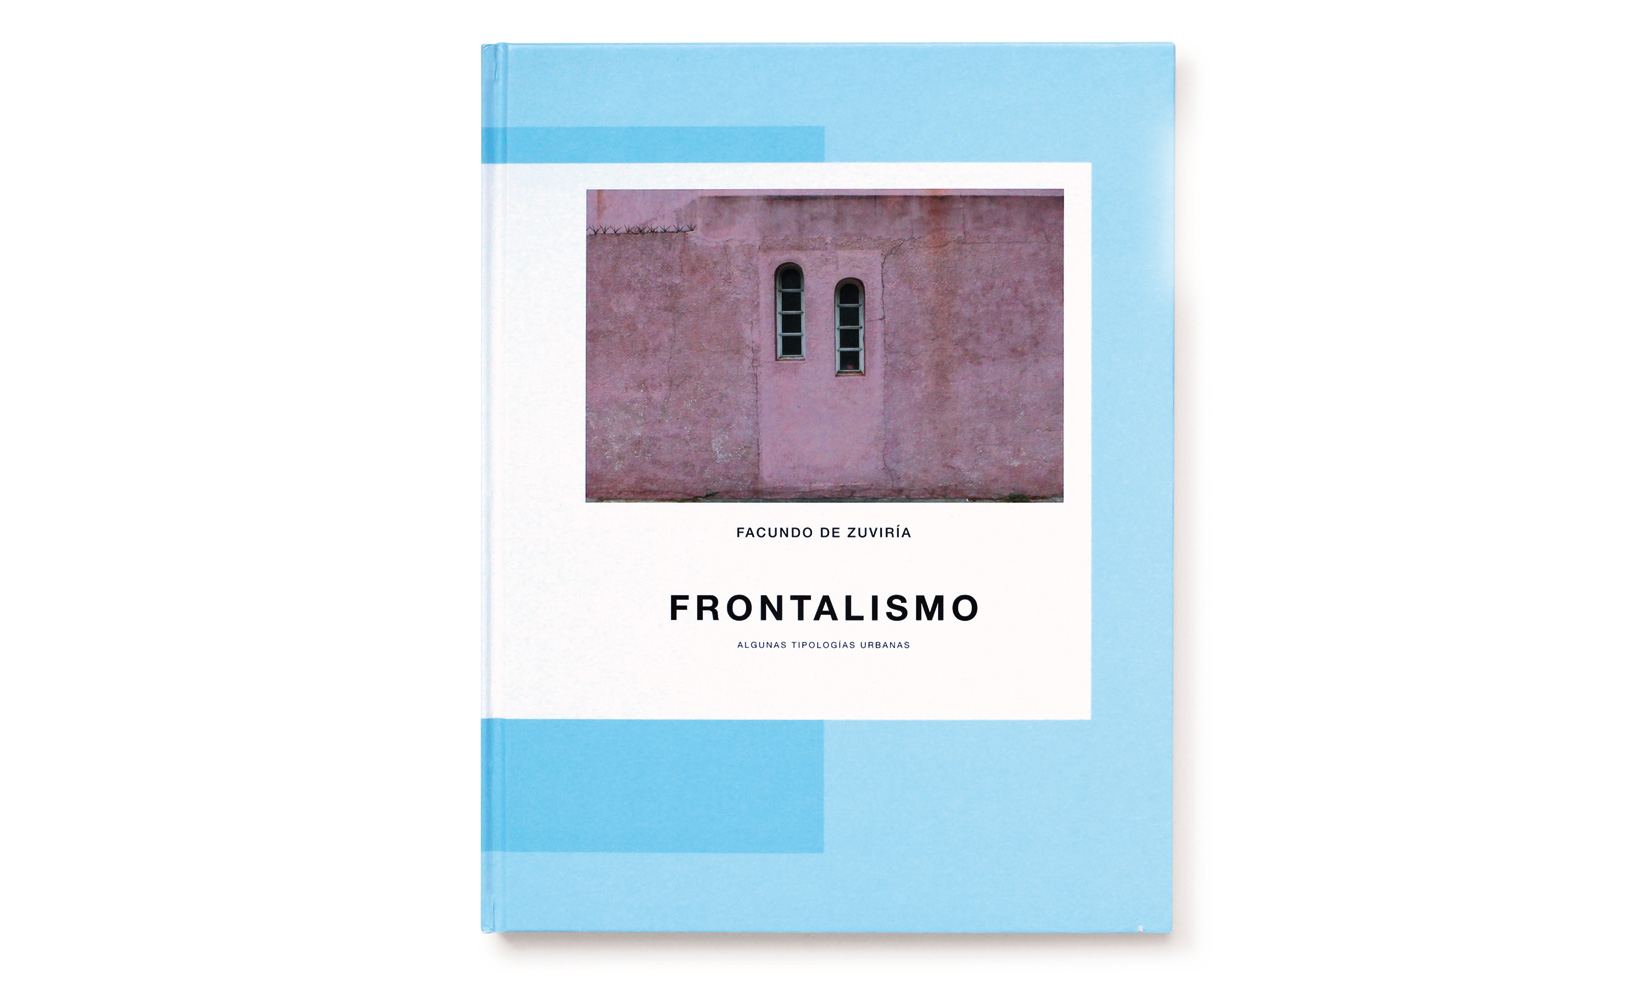 FRONTALISMO-FACUNDO-DE-ZUVIRIA-TOLUCA-STUDIO-OLIVIER-ANDREOTTI-1.jpg